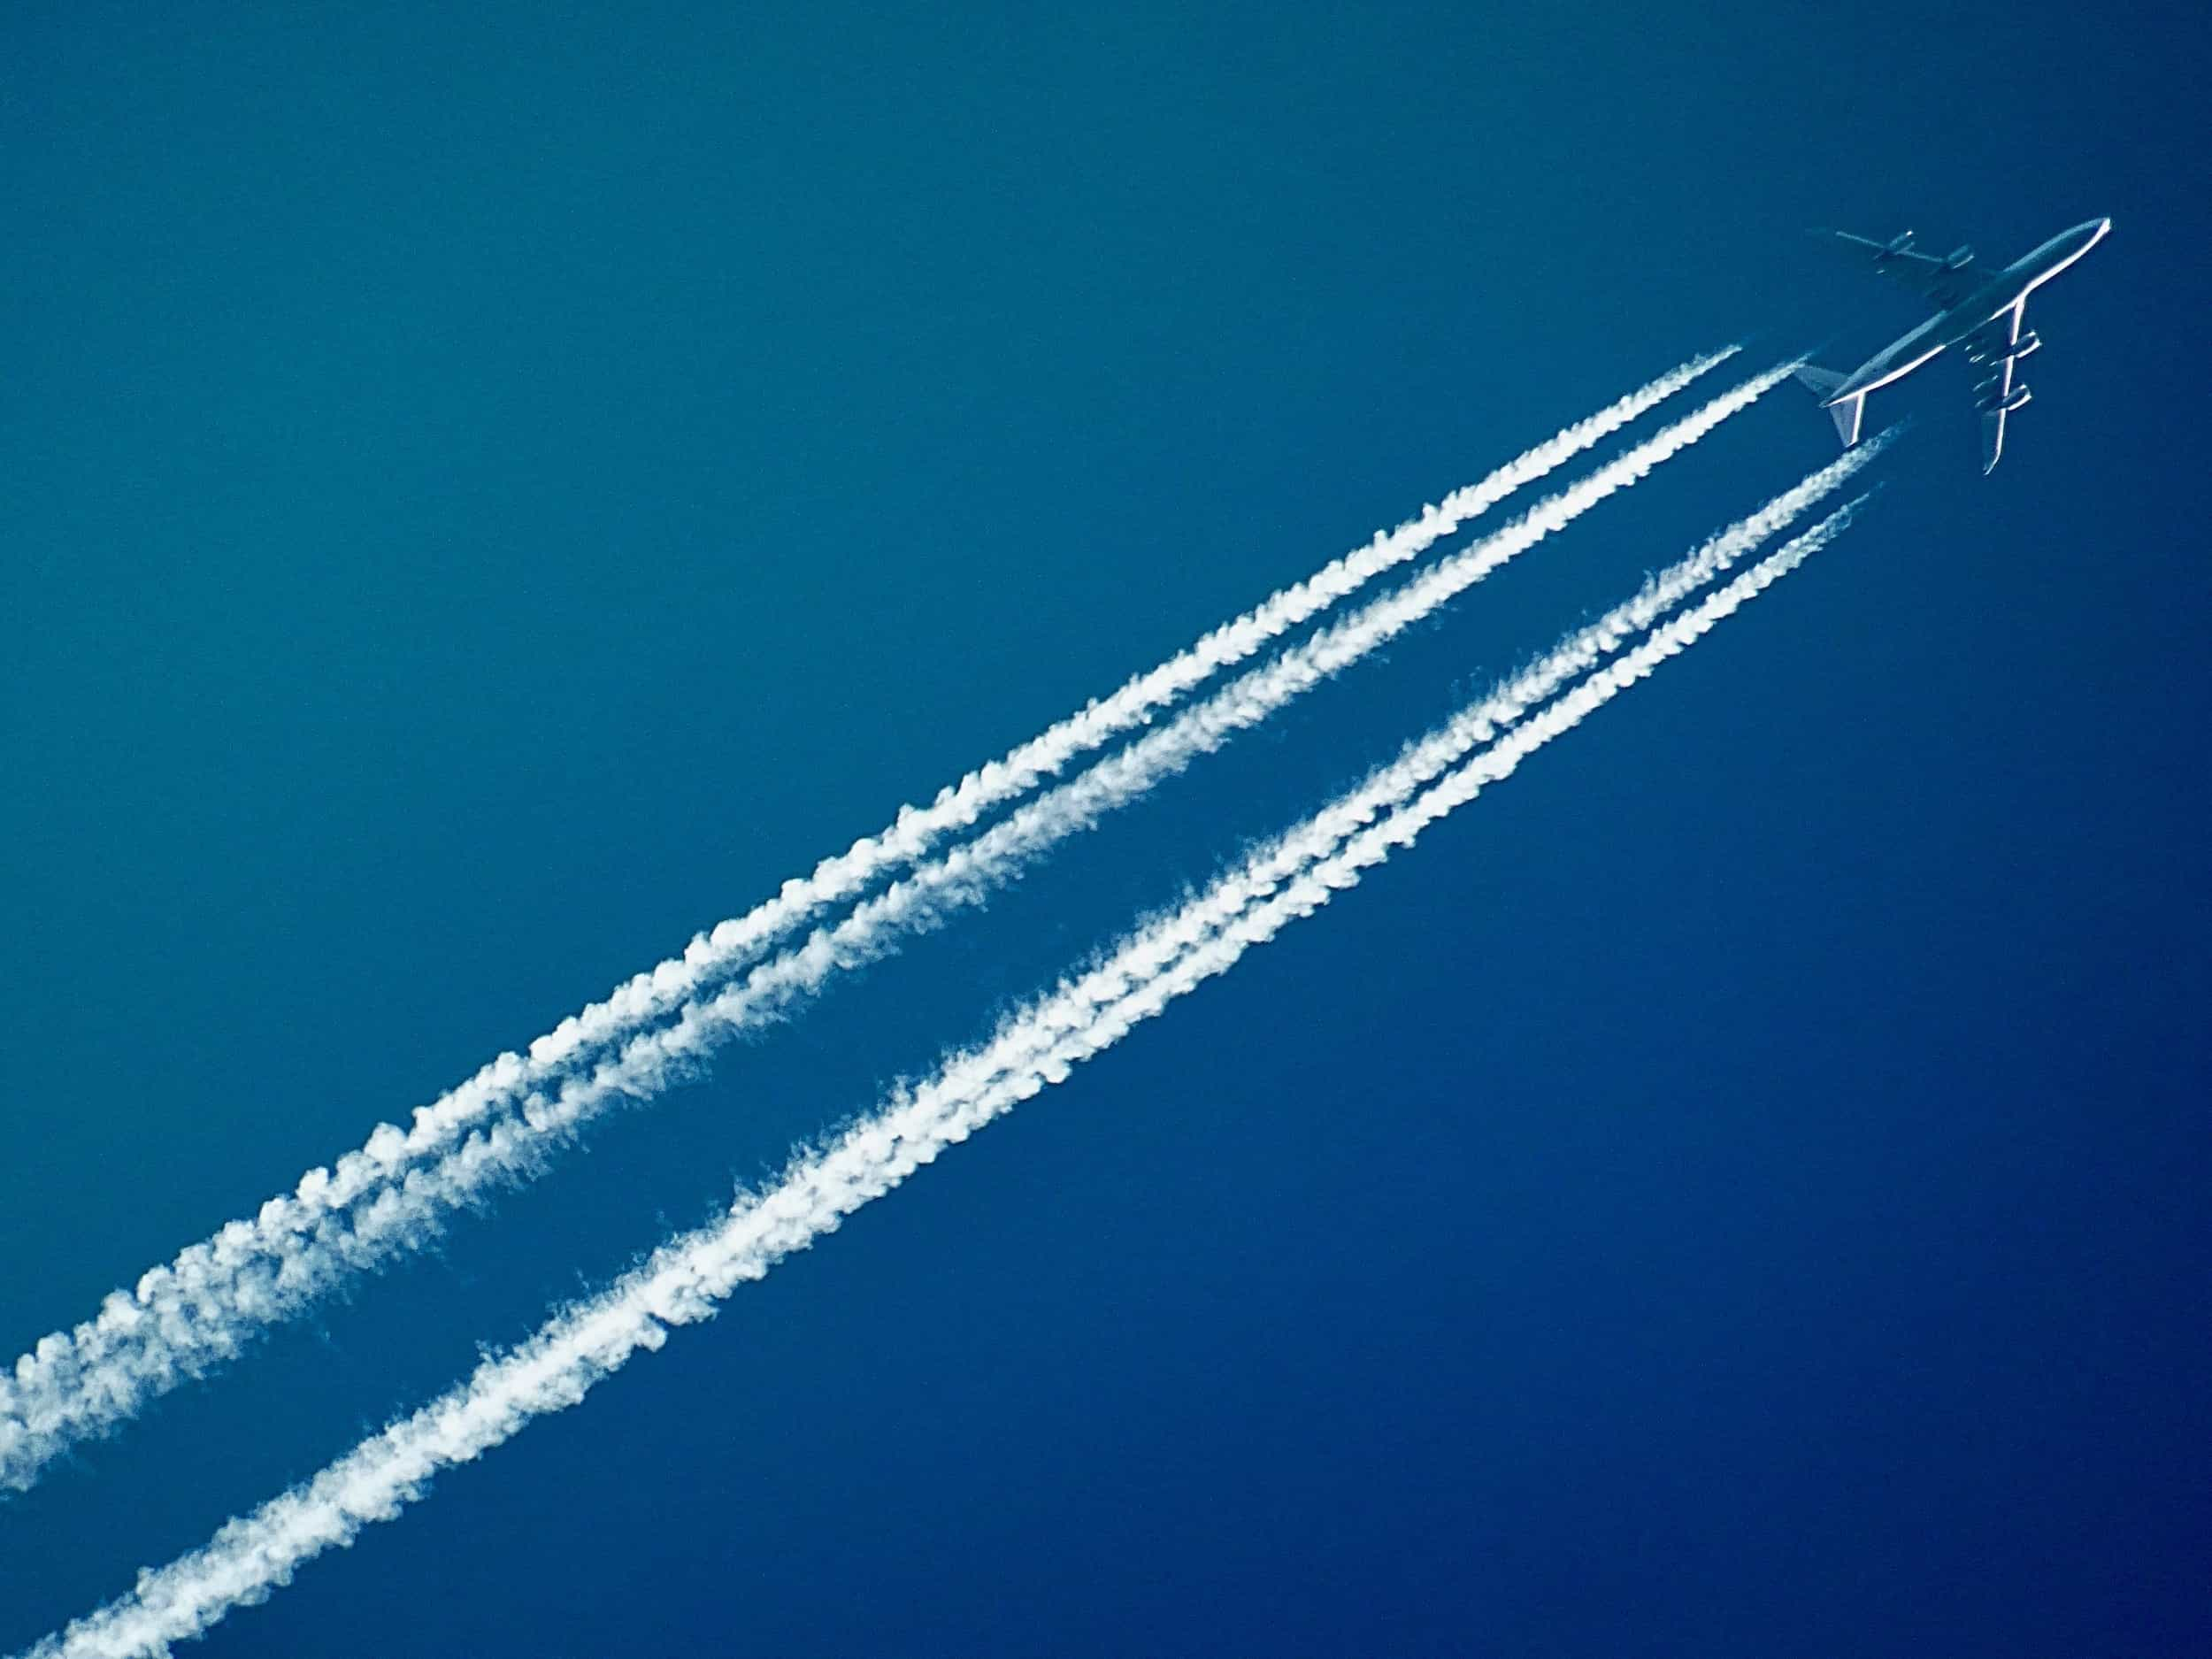 Flightnook - Contrails 2